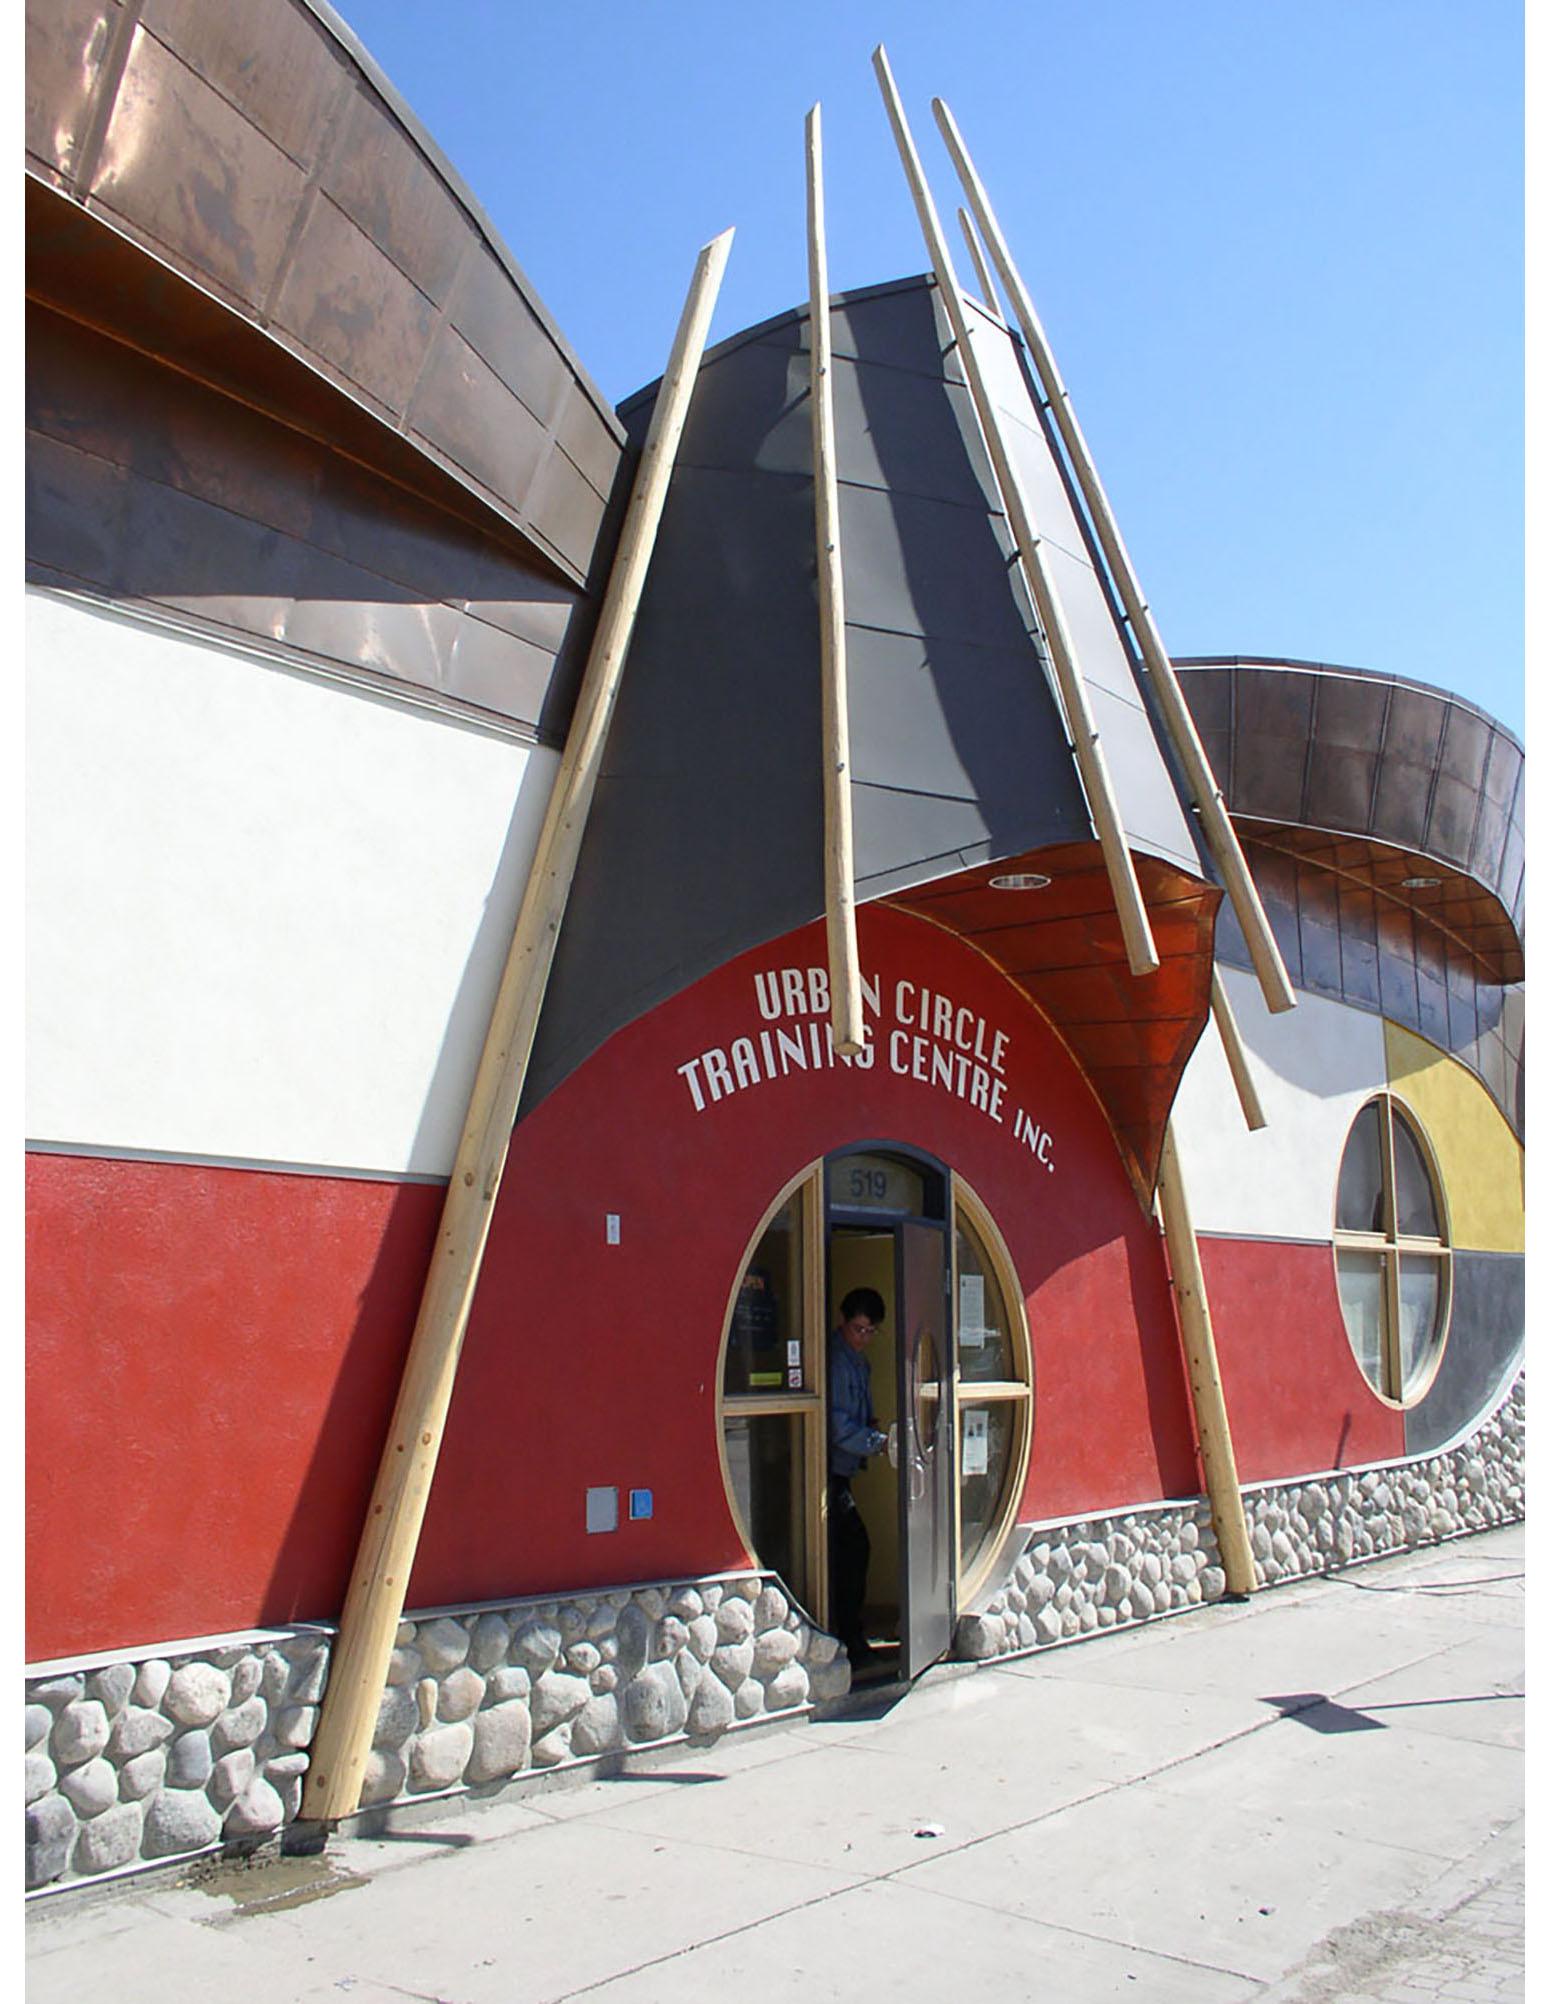 Urban Circle Training Centre, exterior photo of entrance